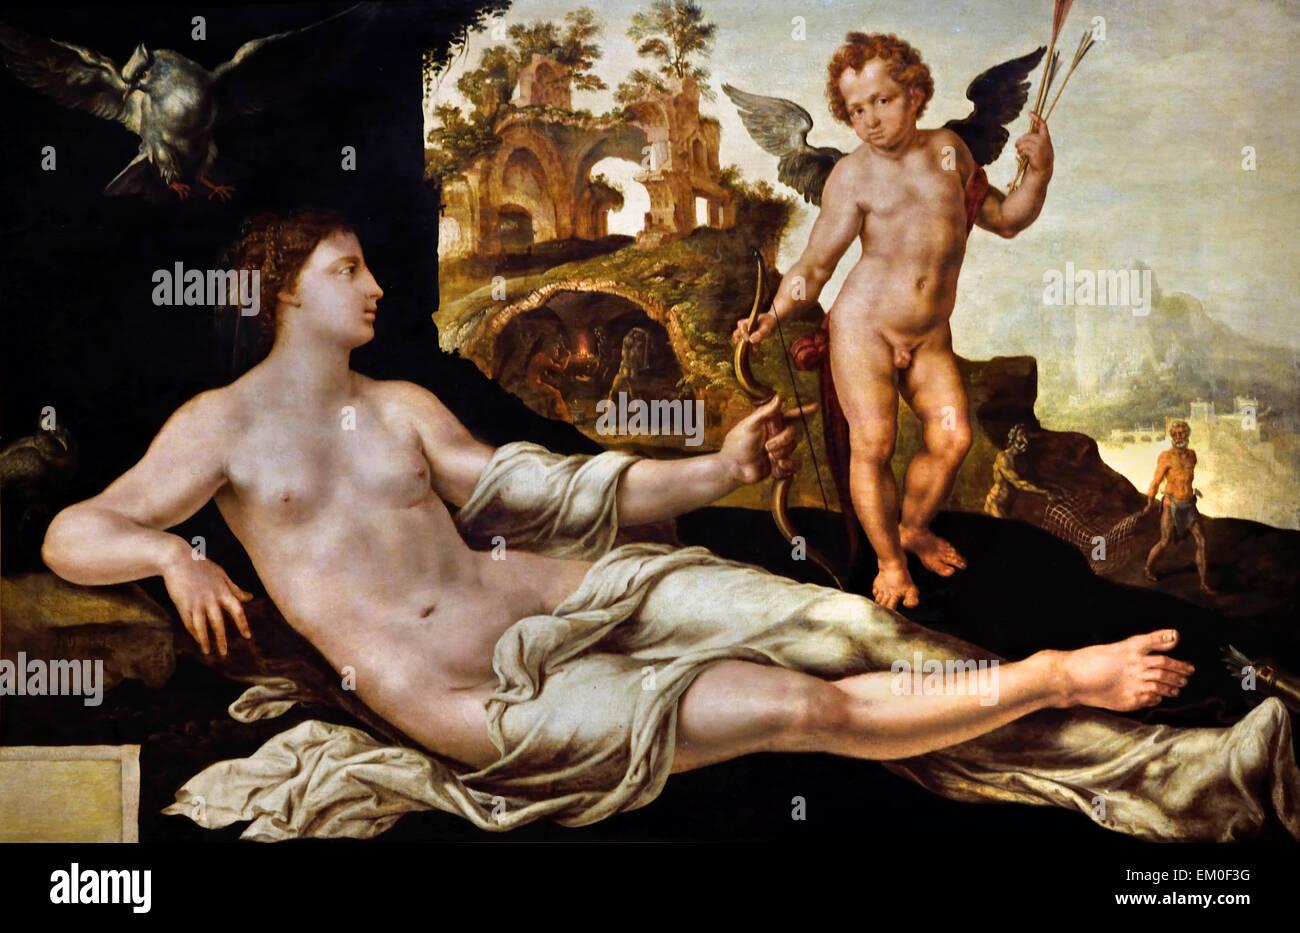 Maerten van Heemskerck Heemskerck (1498 - 1574 ) de Haarlem Venus y Amor 1545 Holanda Holandesa Imagen De Stock